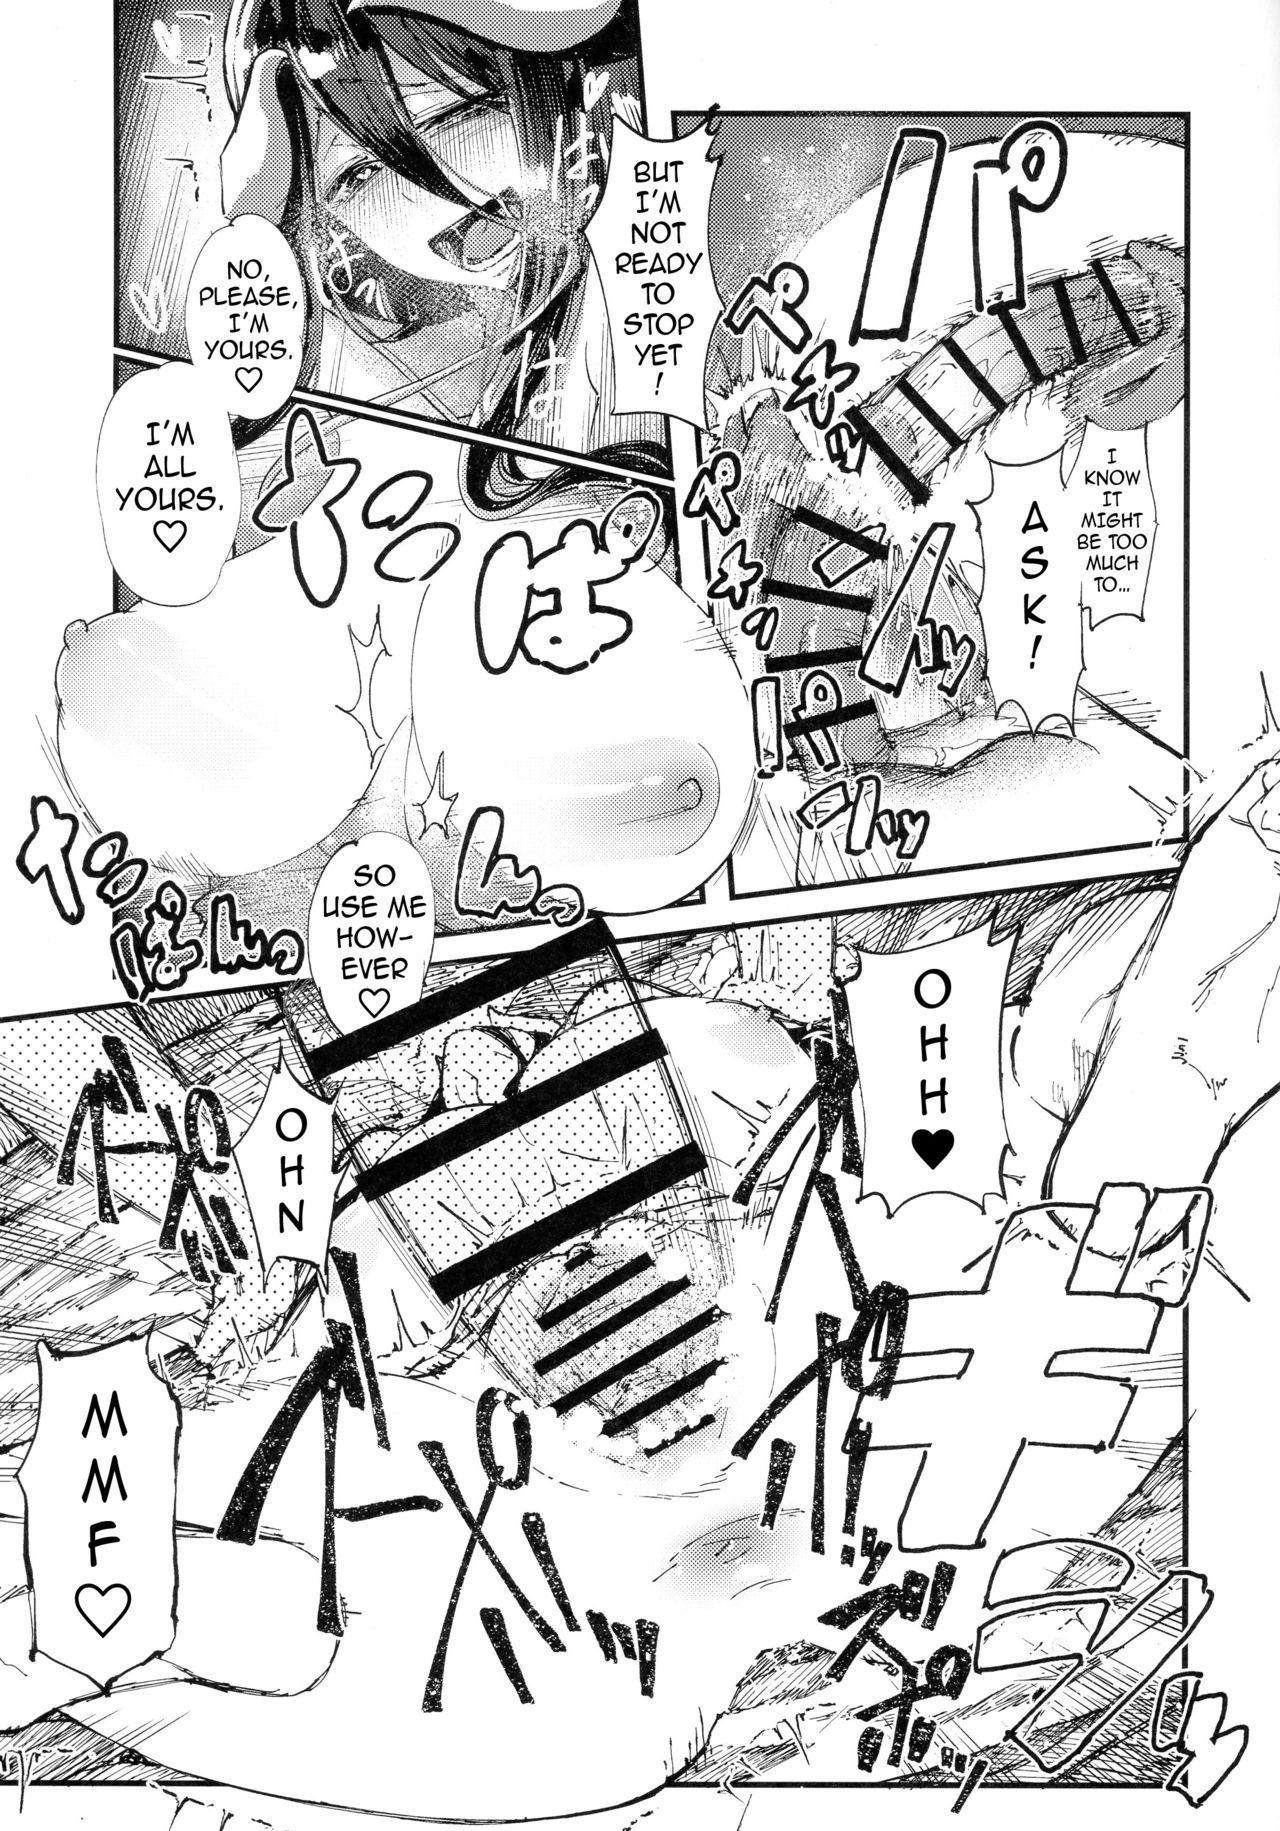 (COMIC1☆13) [Sekigaiken (Komagata)] Ainz-sama no Oyotsugi o! | Ainz-sama, Leave Your Heir to! (Overlord) [English] {darknight} 23